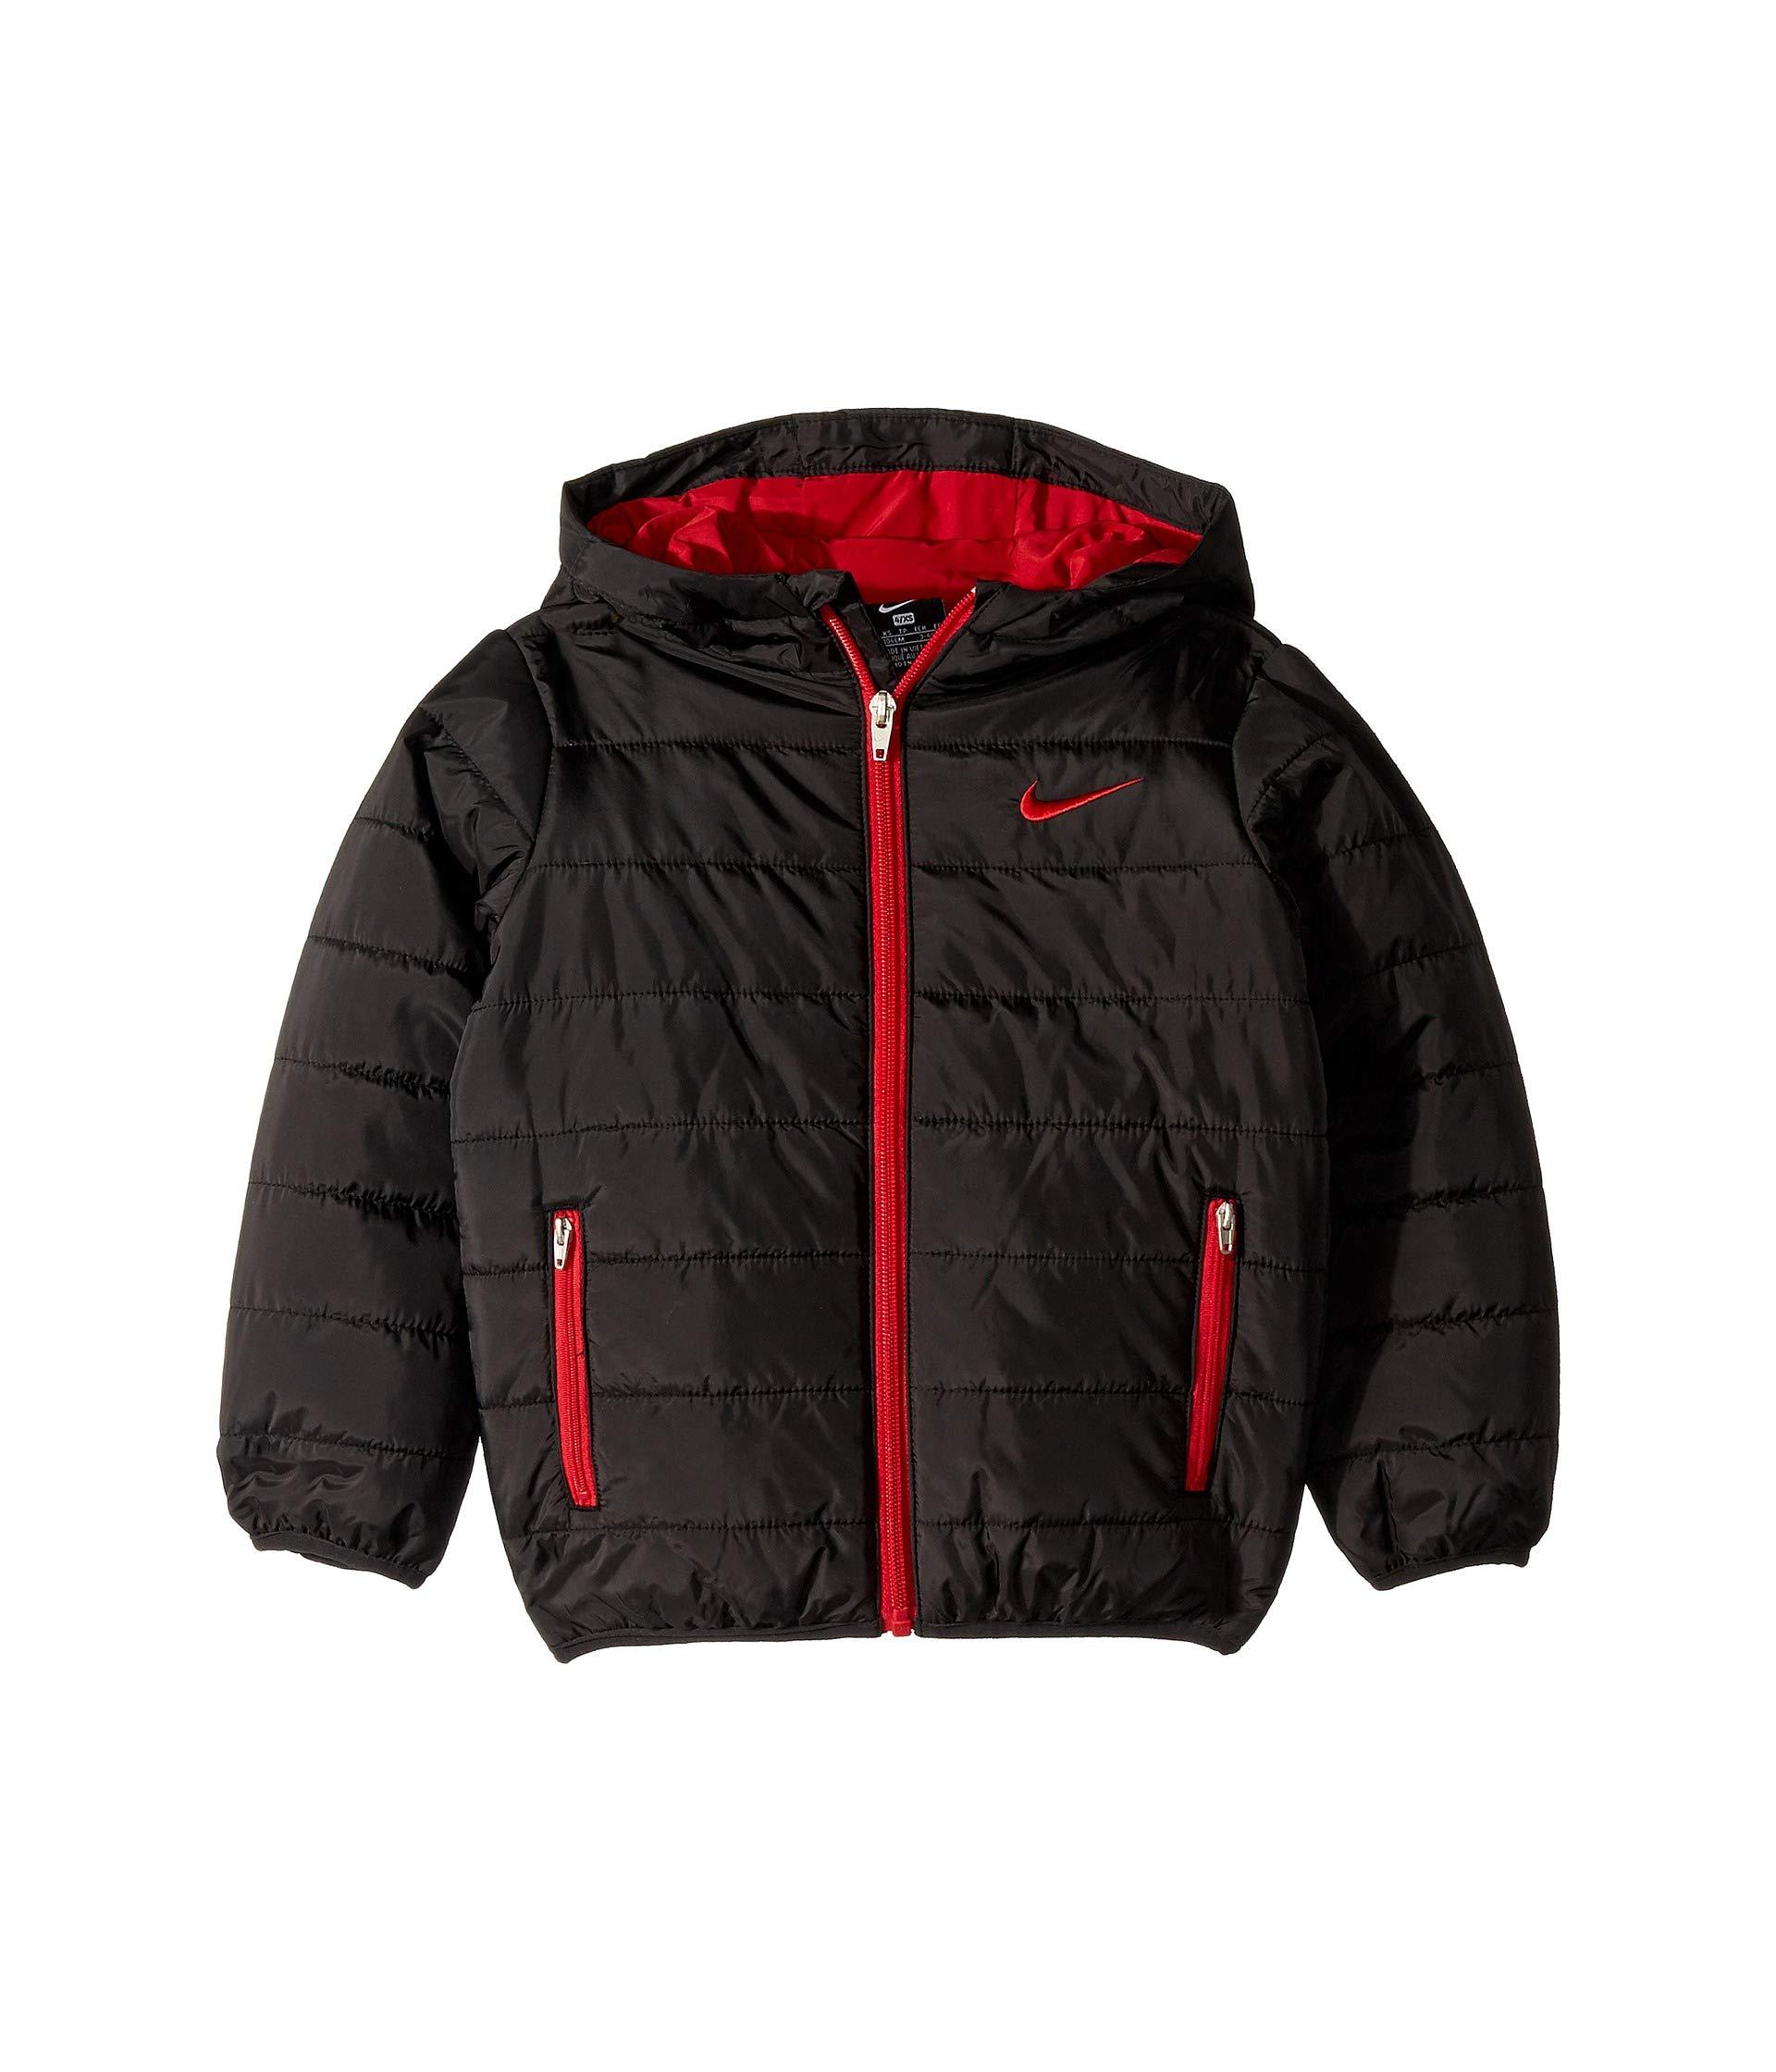 Nike Kids Boy's Quilted Jacket (Little Kids) Black 4 US Little Kid by Nike (Image #1)